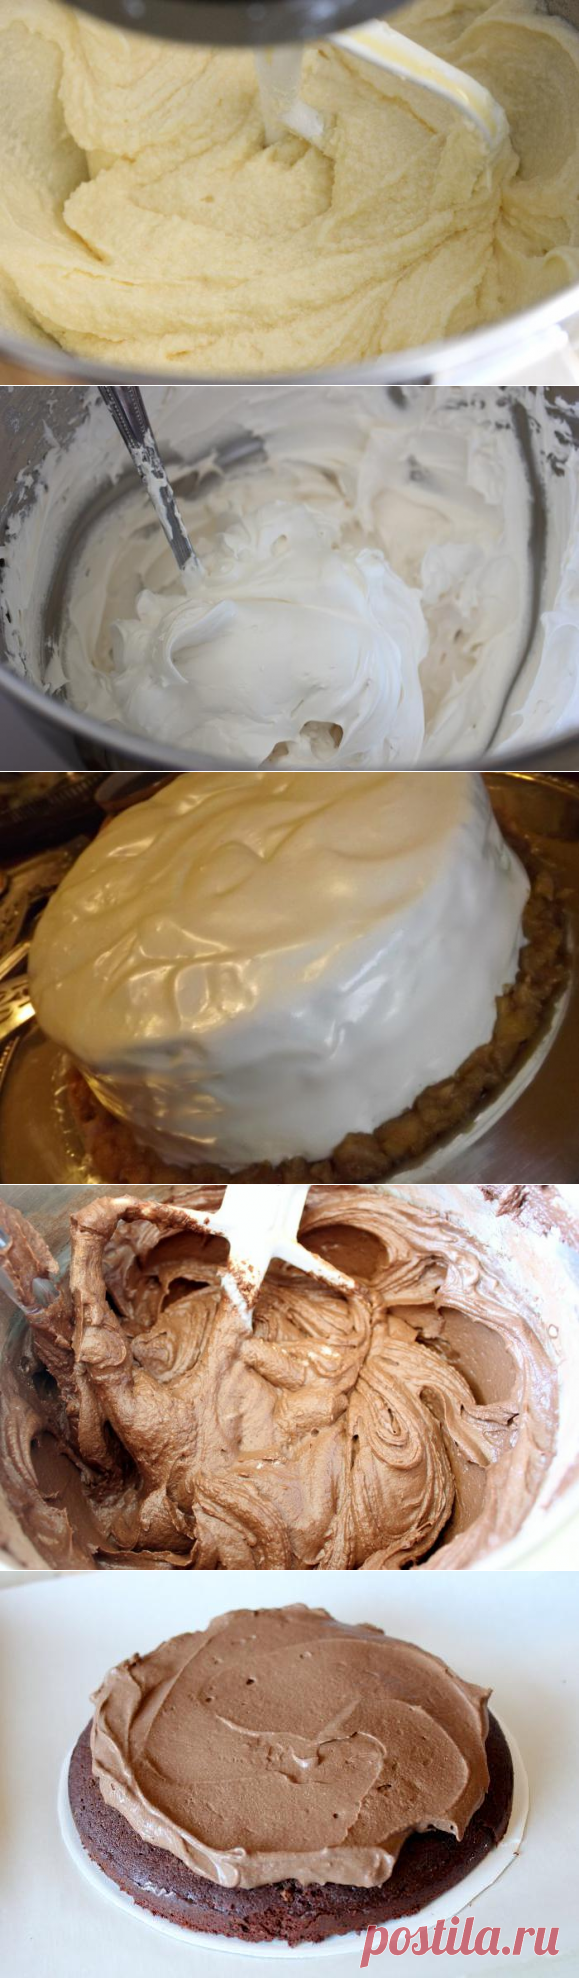 Крем для бисквитного торта в домашних условиях рецепт